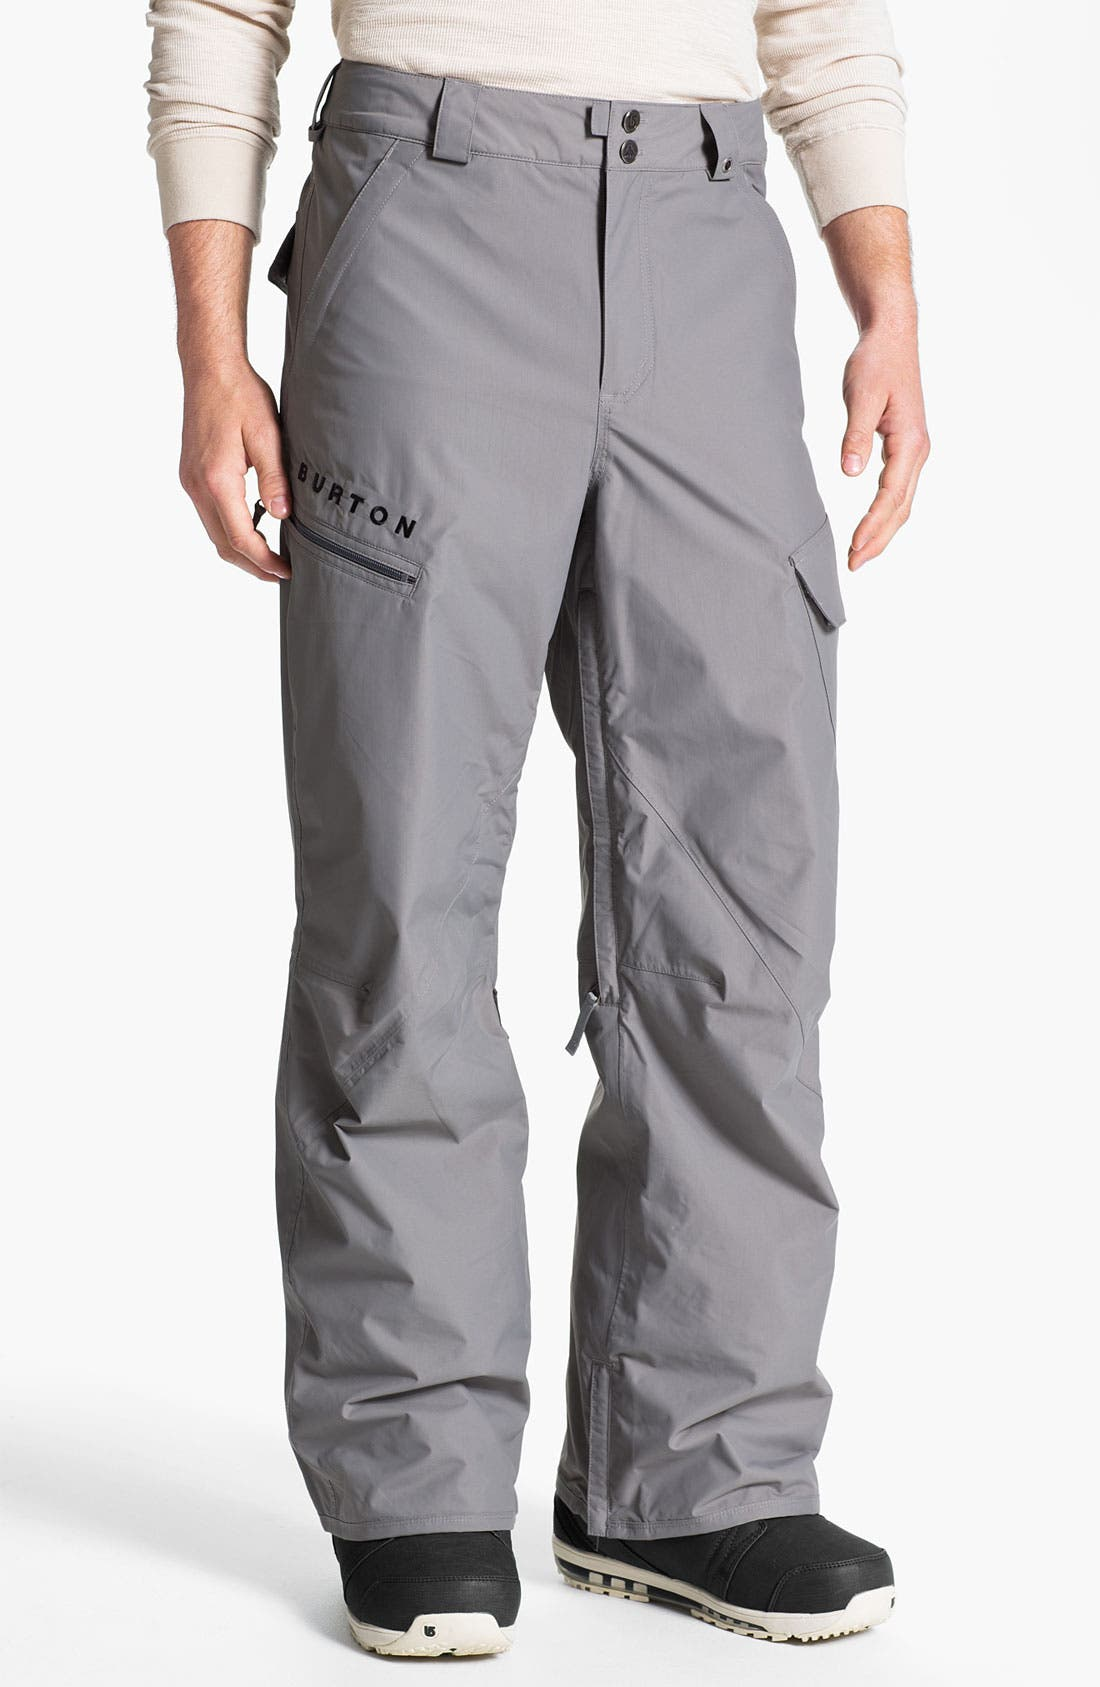 Main Image - Burton 'Poacher' Snowboard Pants